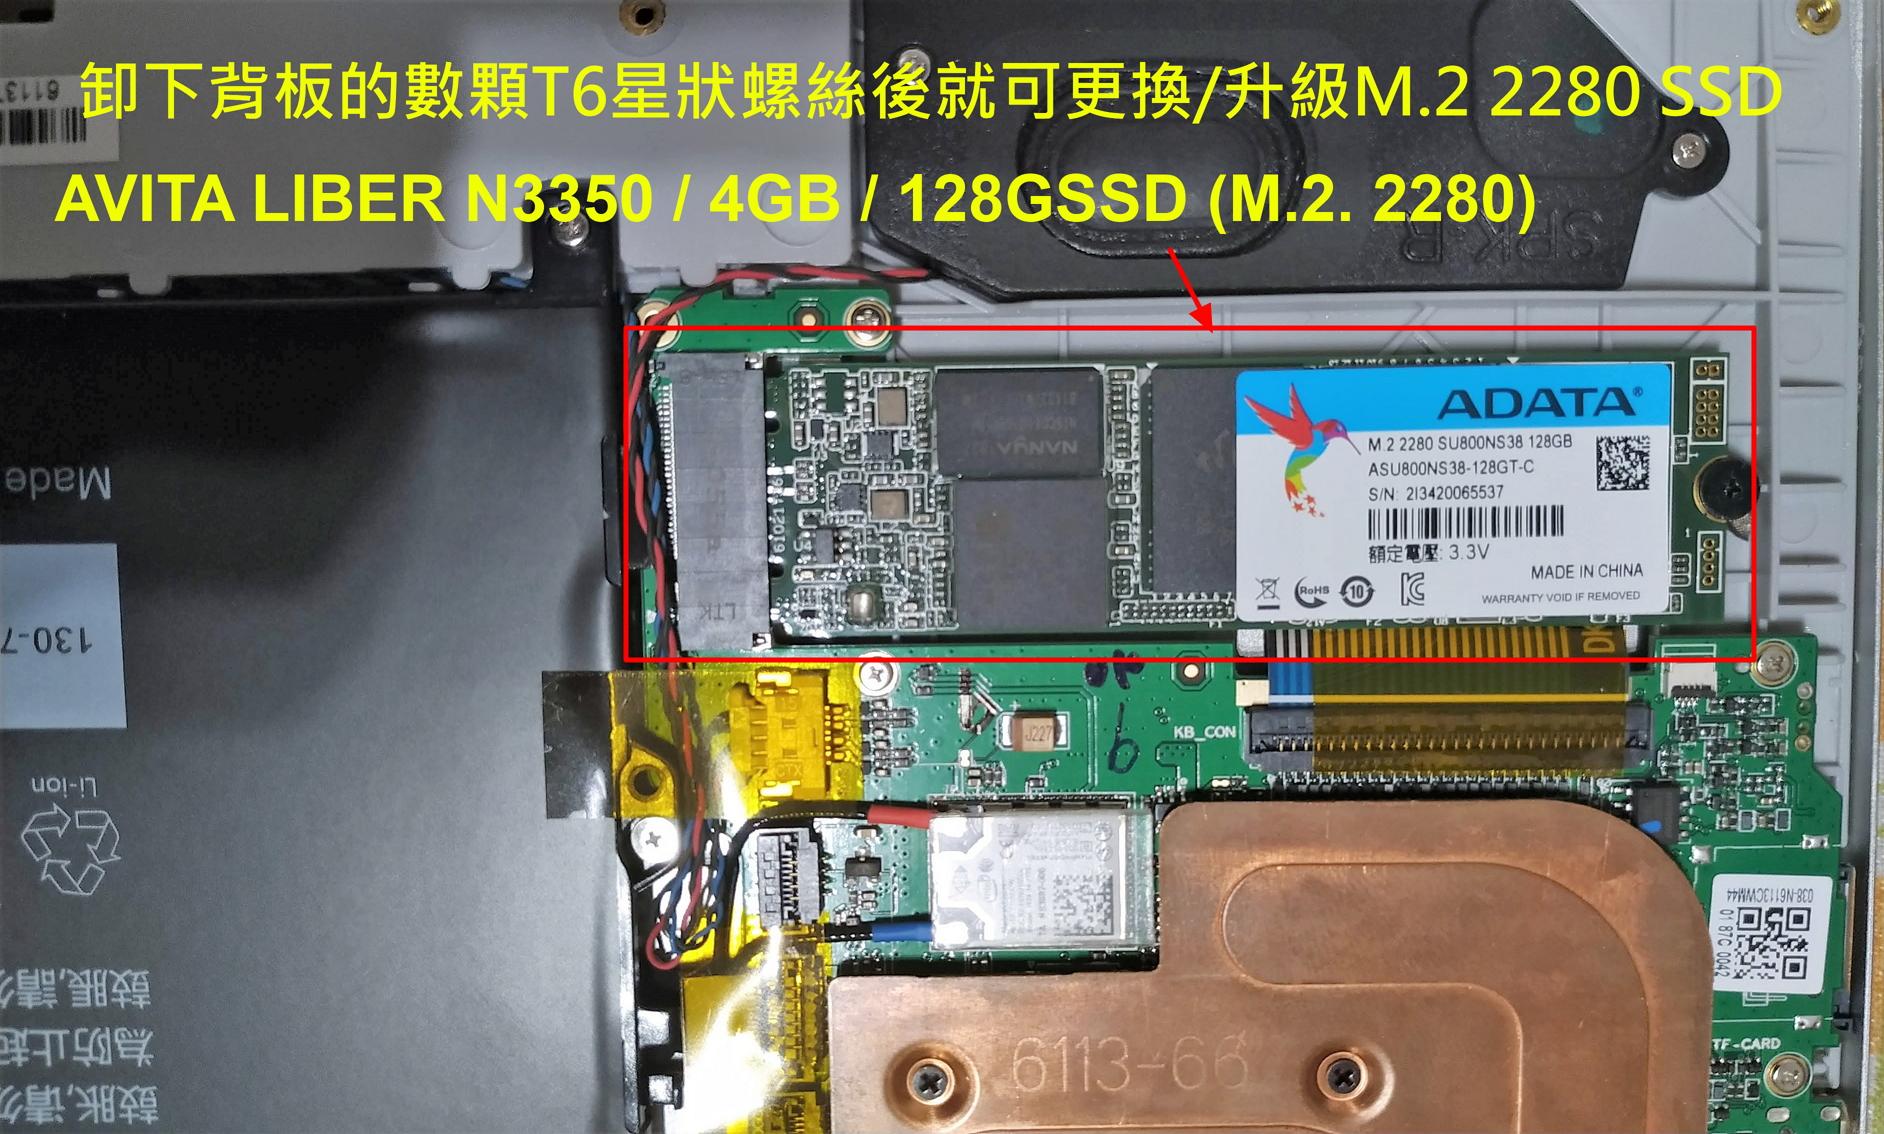 Avita Liber N3350 型筆電 升級記要 | Tenru